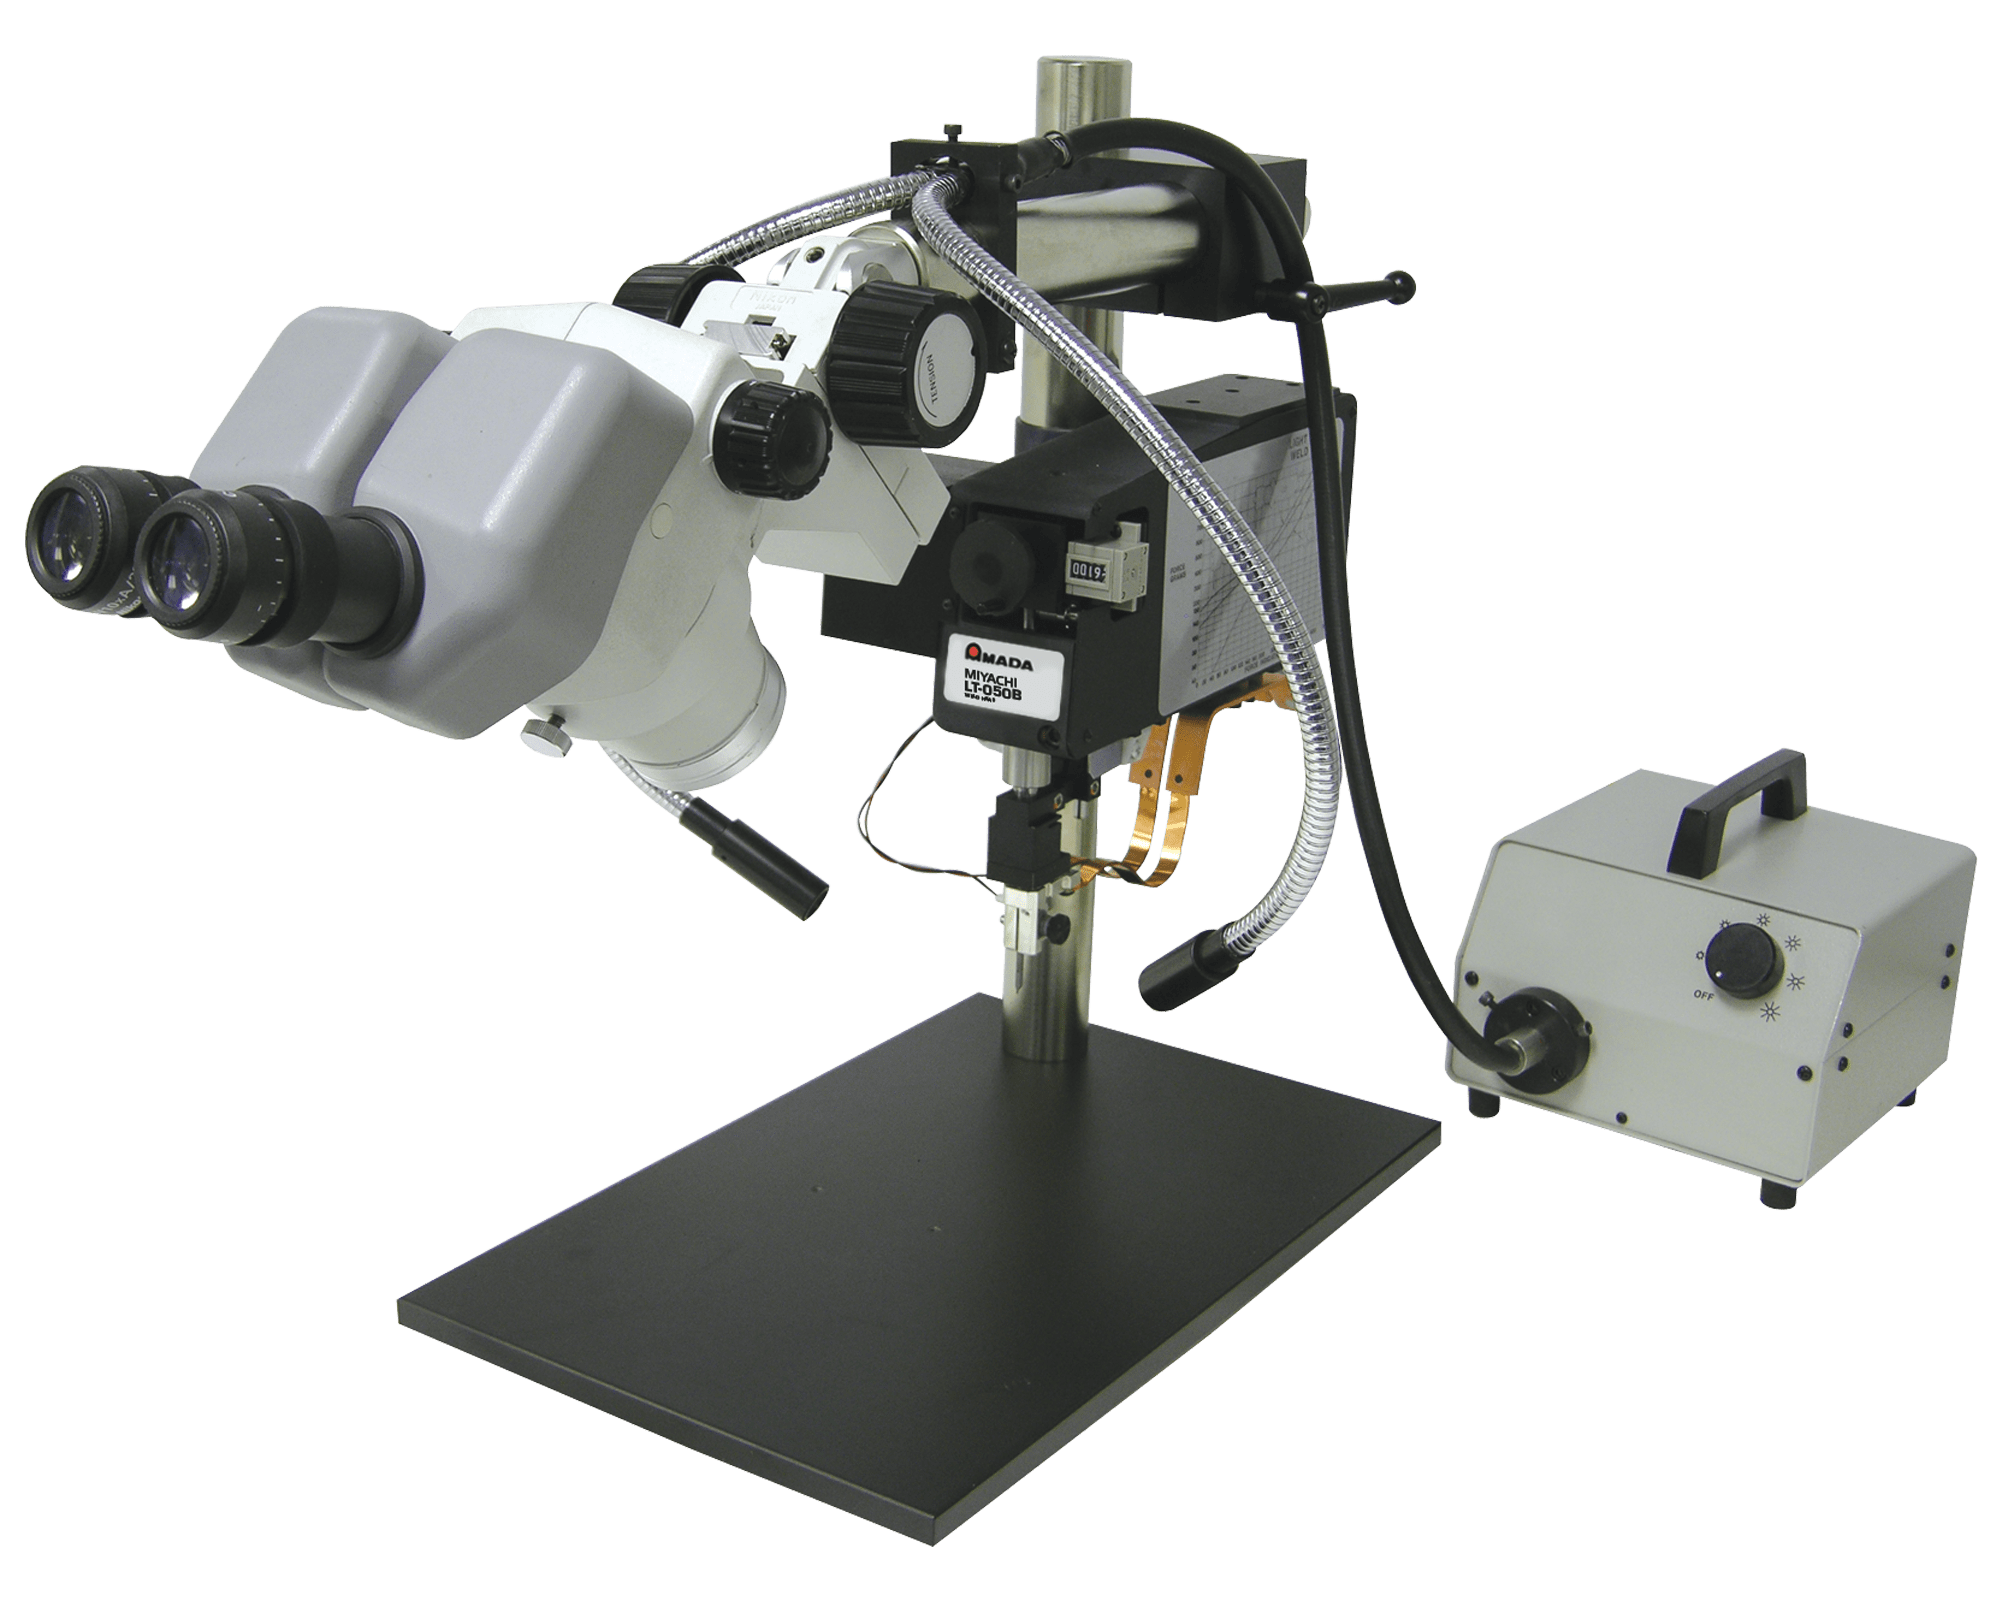 LT-050B-F/UB Light Force Manual Weld Head - Parallel Gap Electrodes